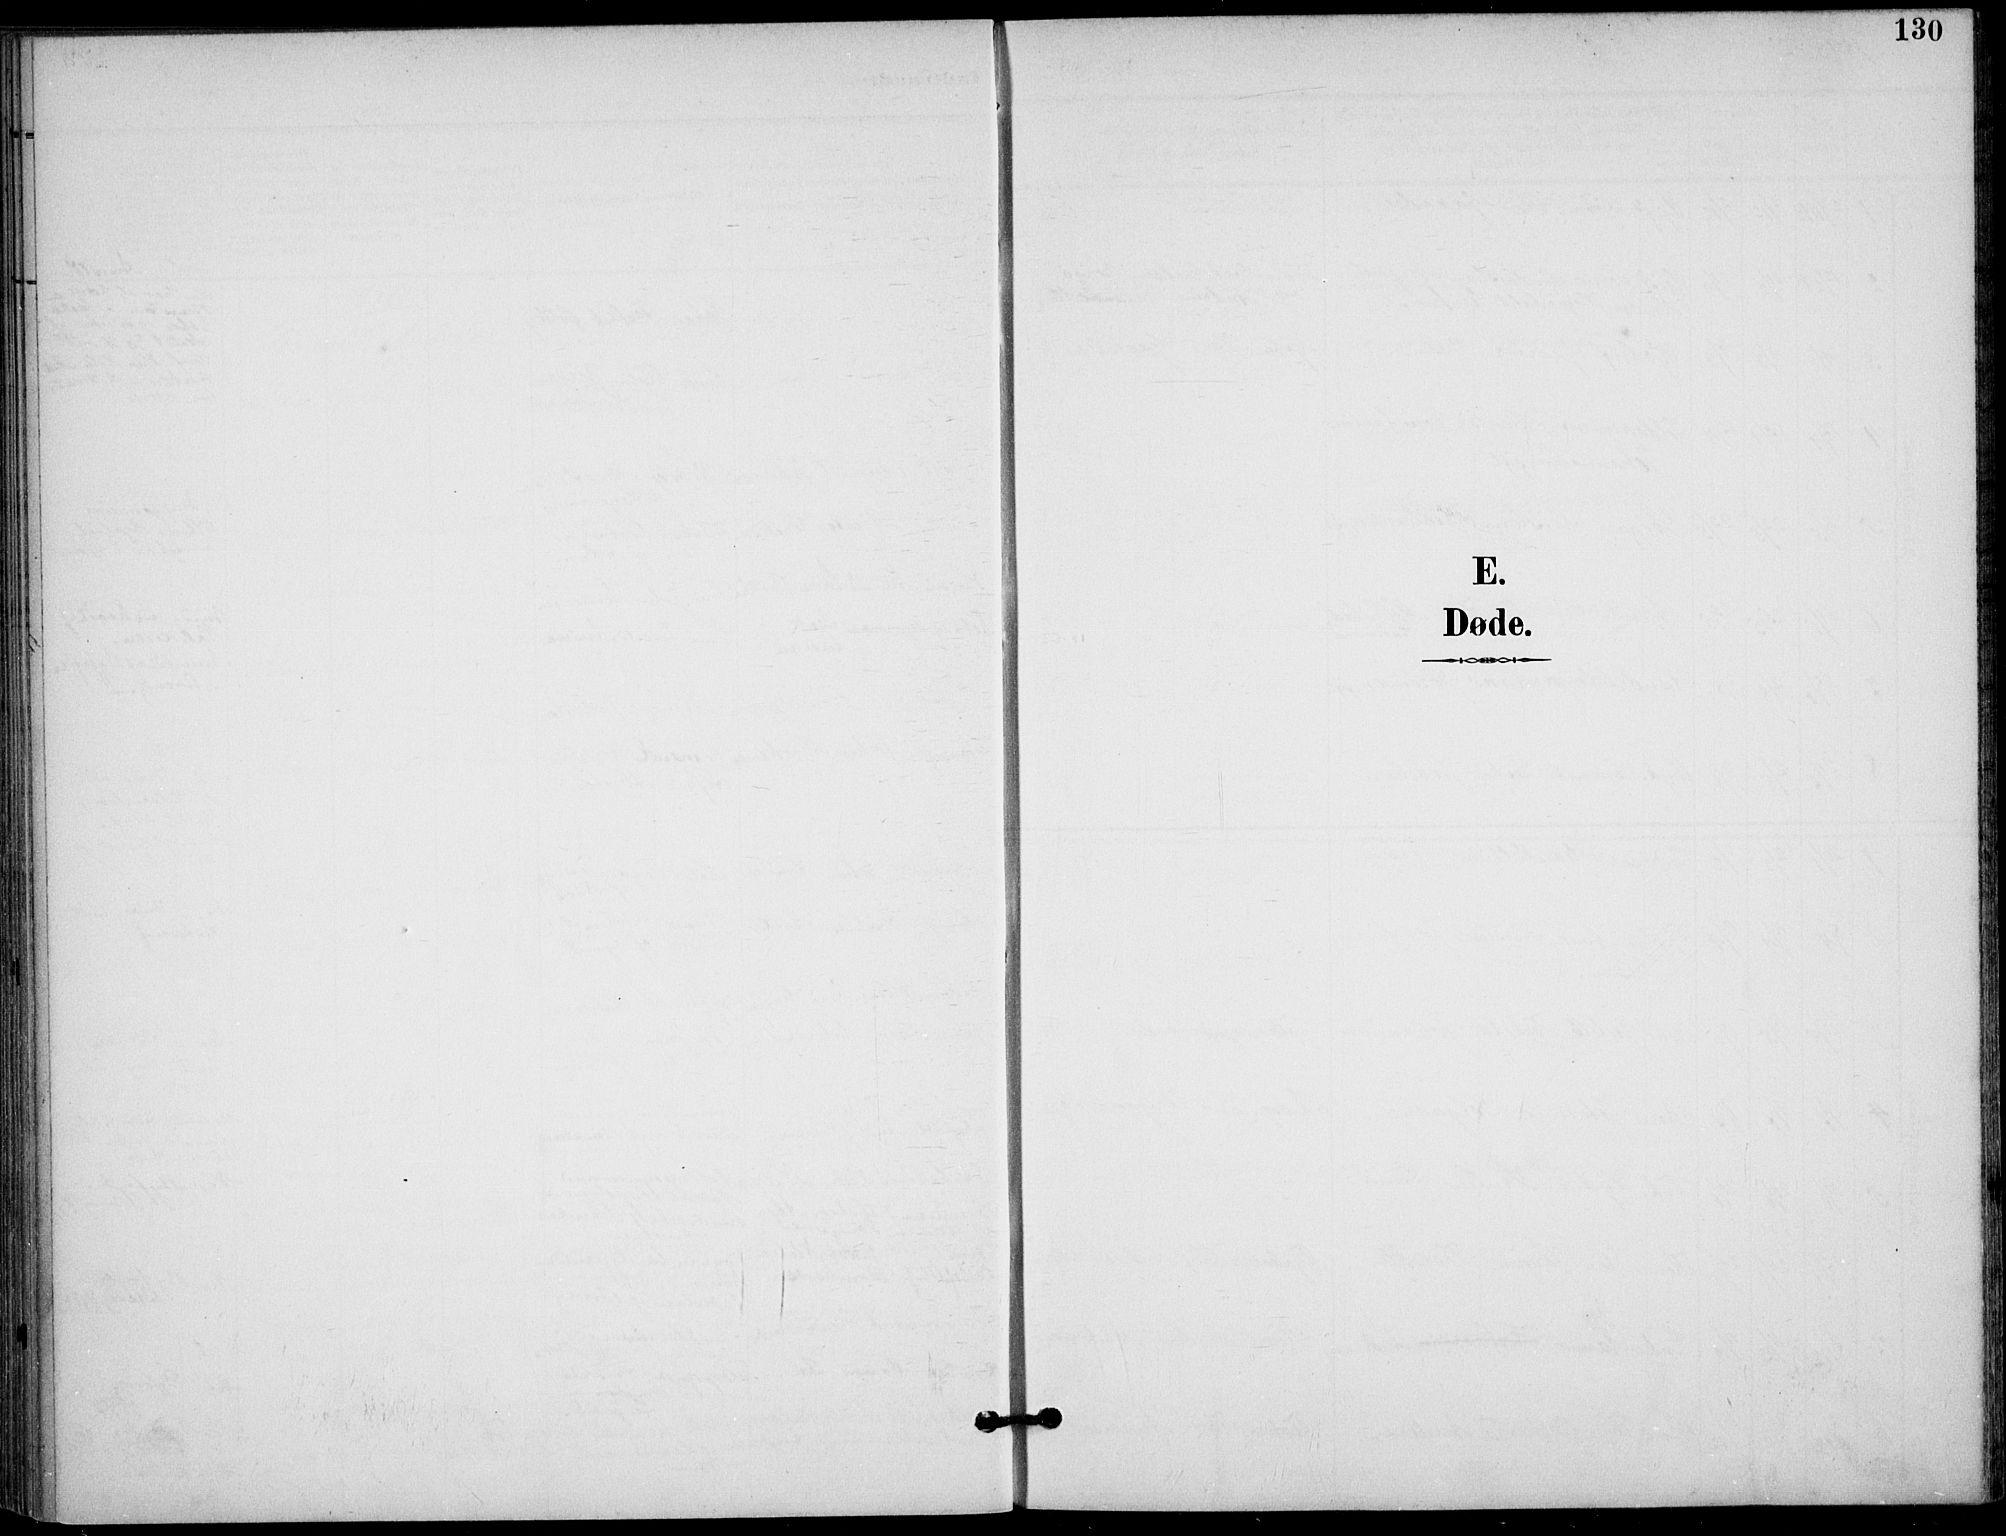 SAKO, Langesund kirkebøker, F/Fa/L0003: Ministerialbok nr. 3, 1893-1907, s. 130